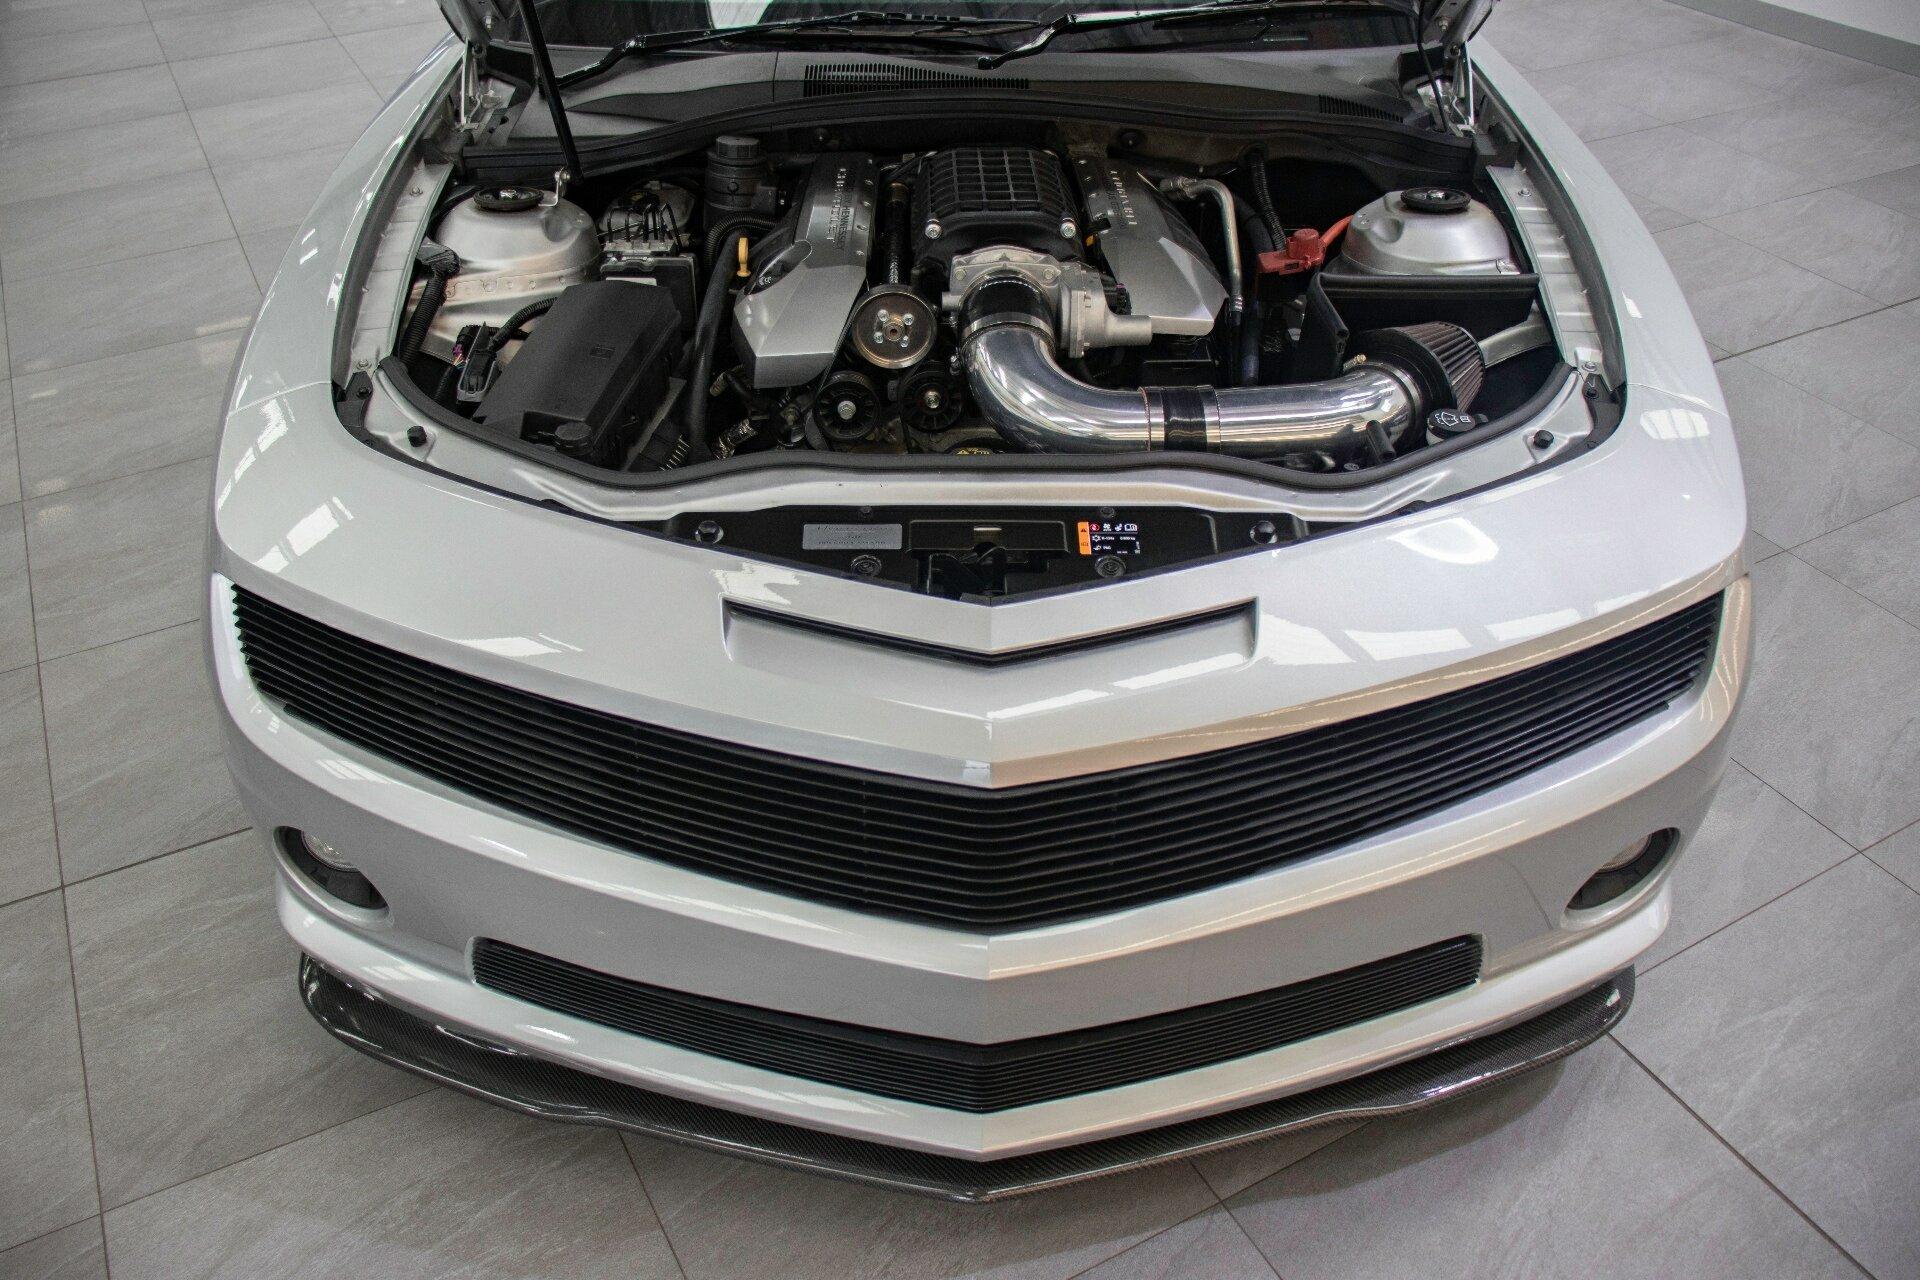 2010 Chevrolet Camaro Hennessey Hpe600